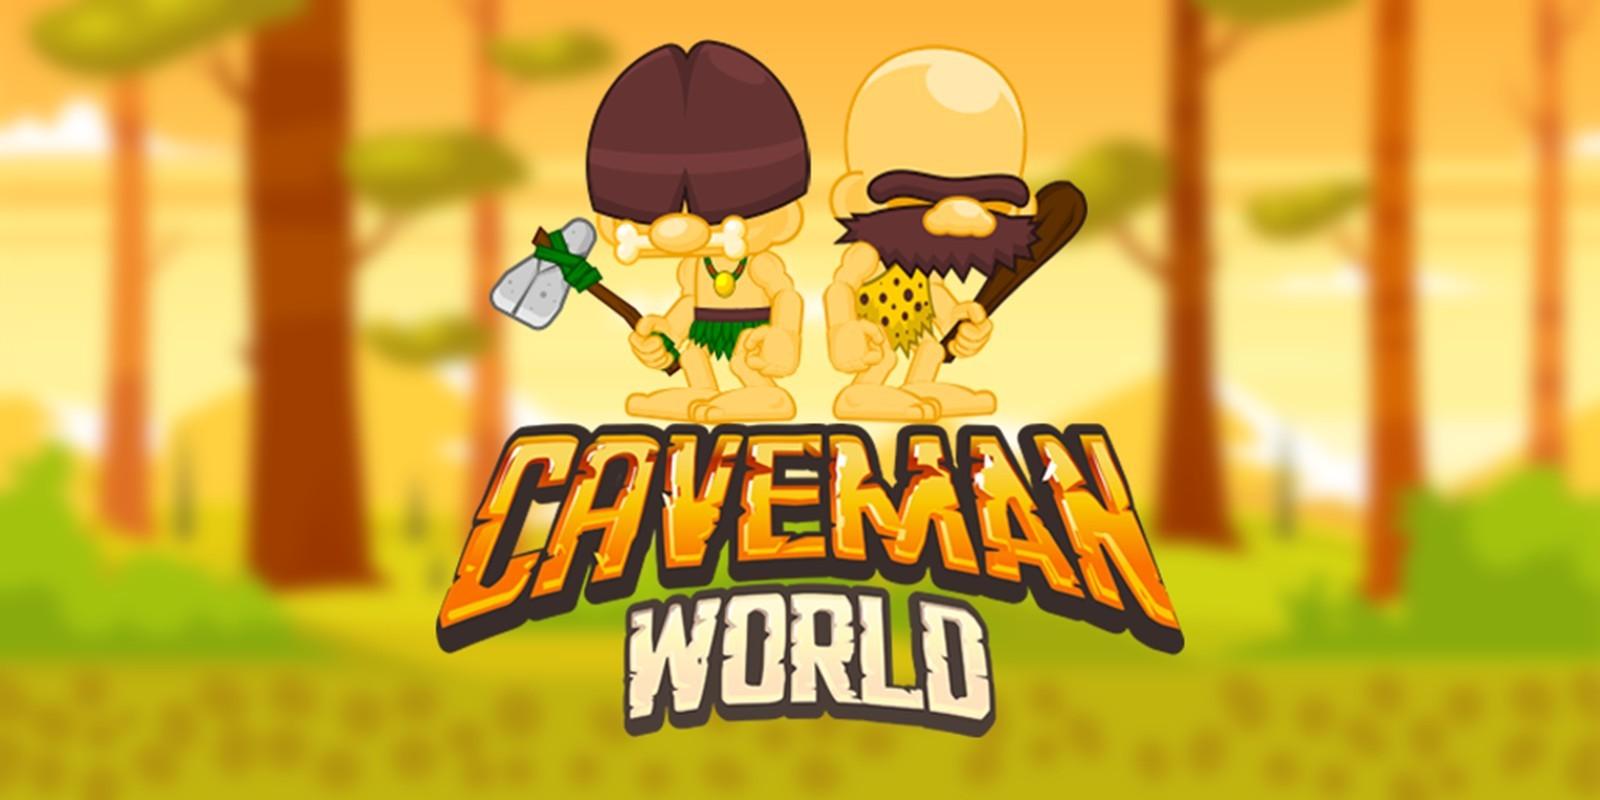 Caveman World - iOS Game Source Code